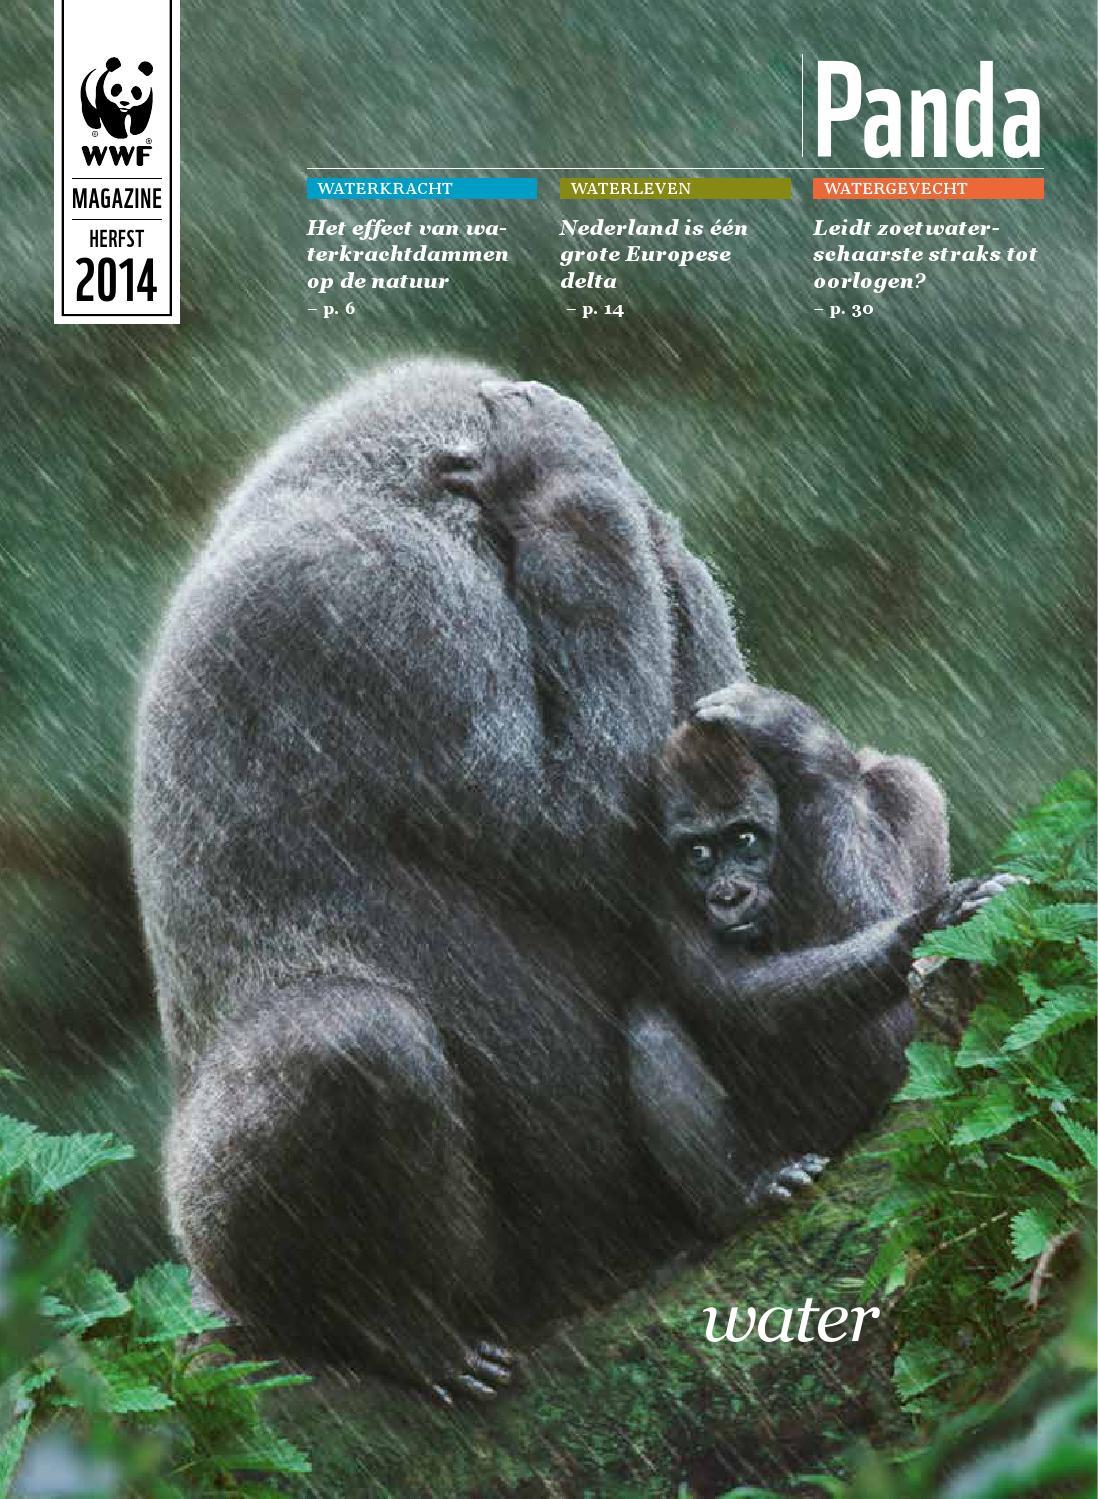 Panda herfst 2014 by Wereld Natuur Fonds   issuu